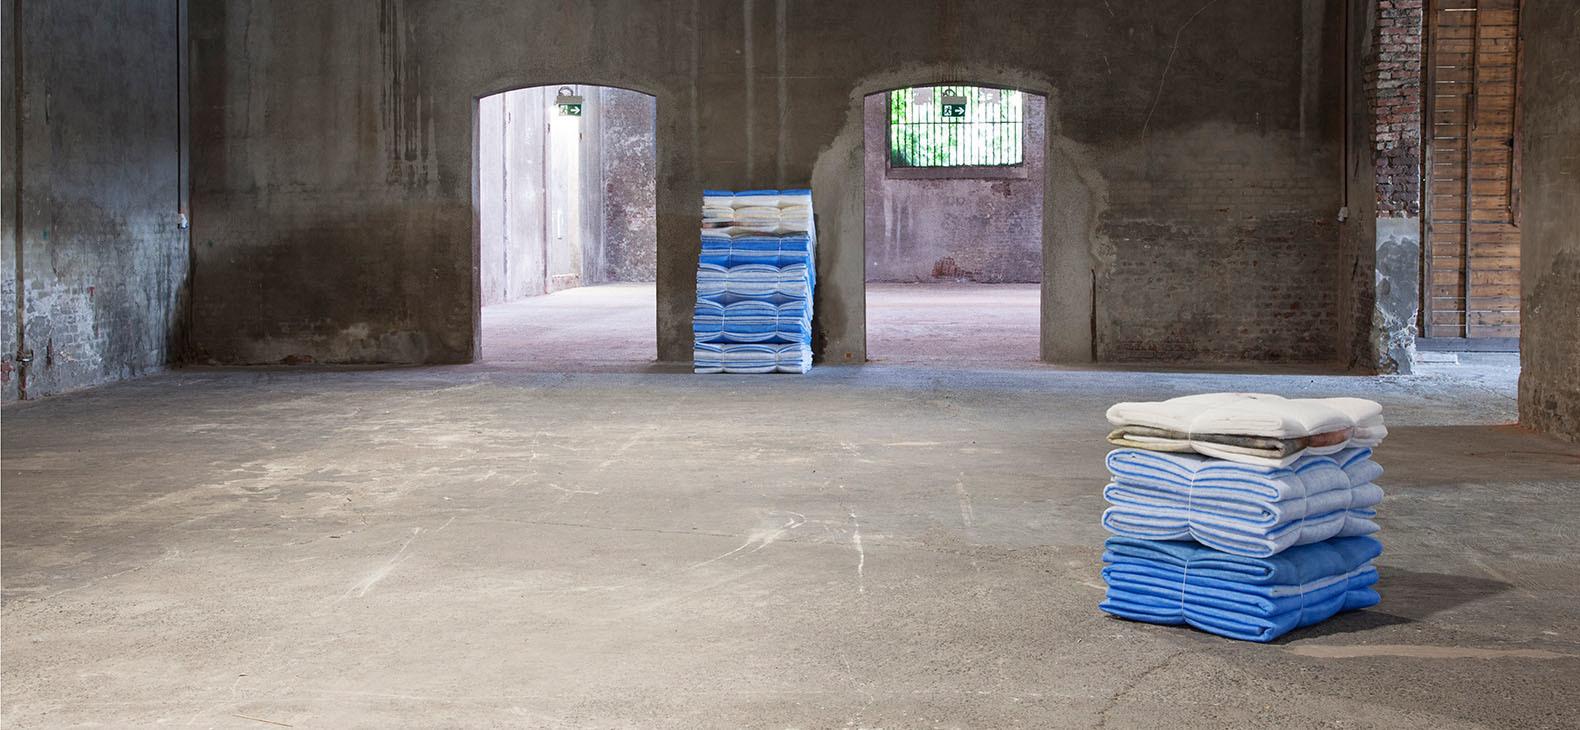 Corinna Gosmaro: Installation